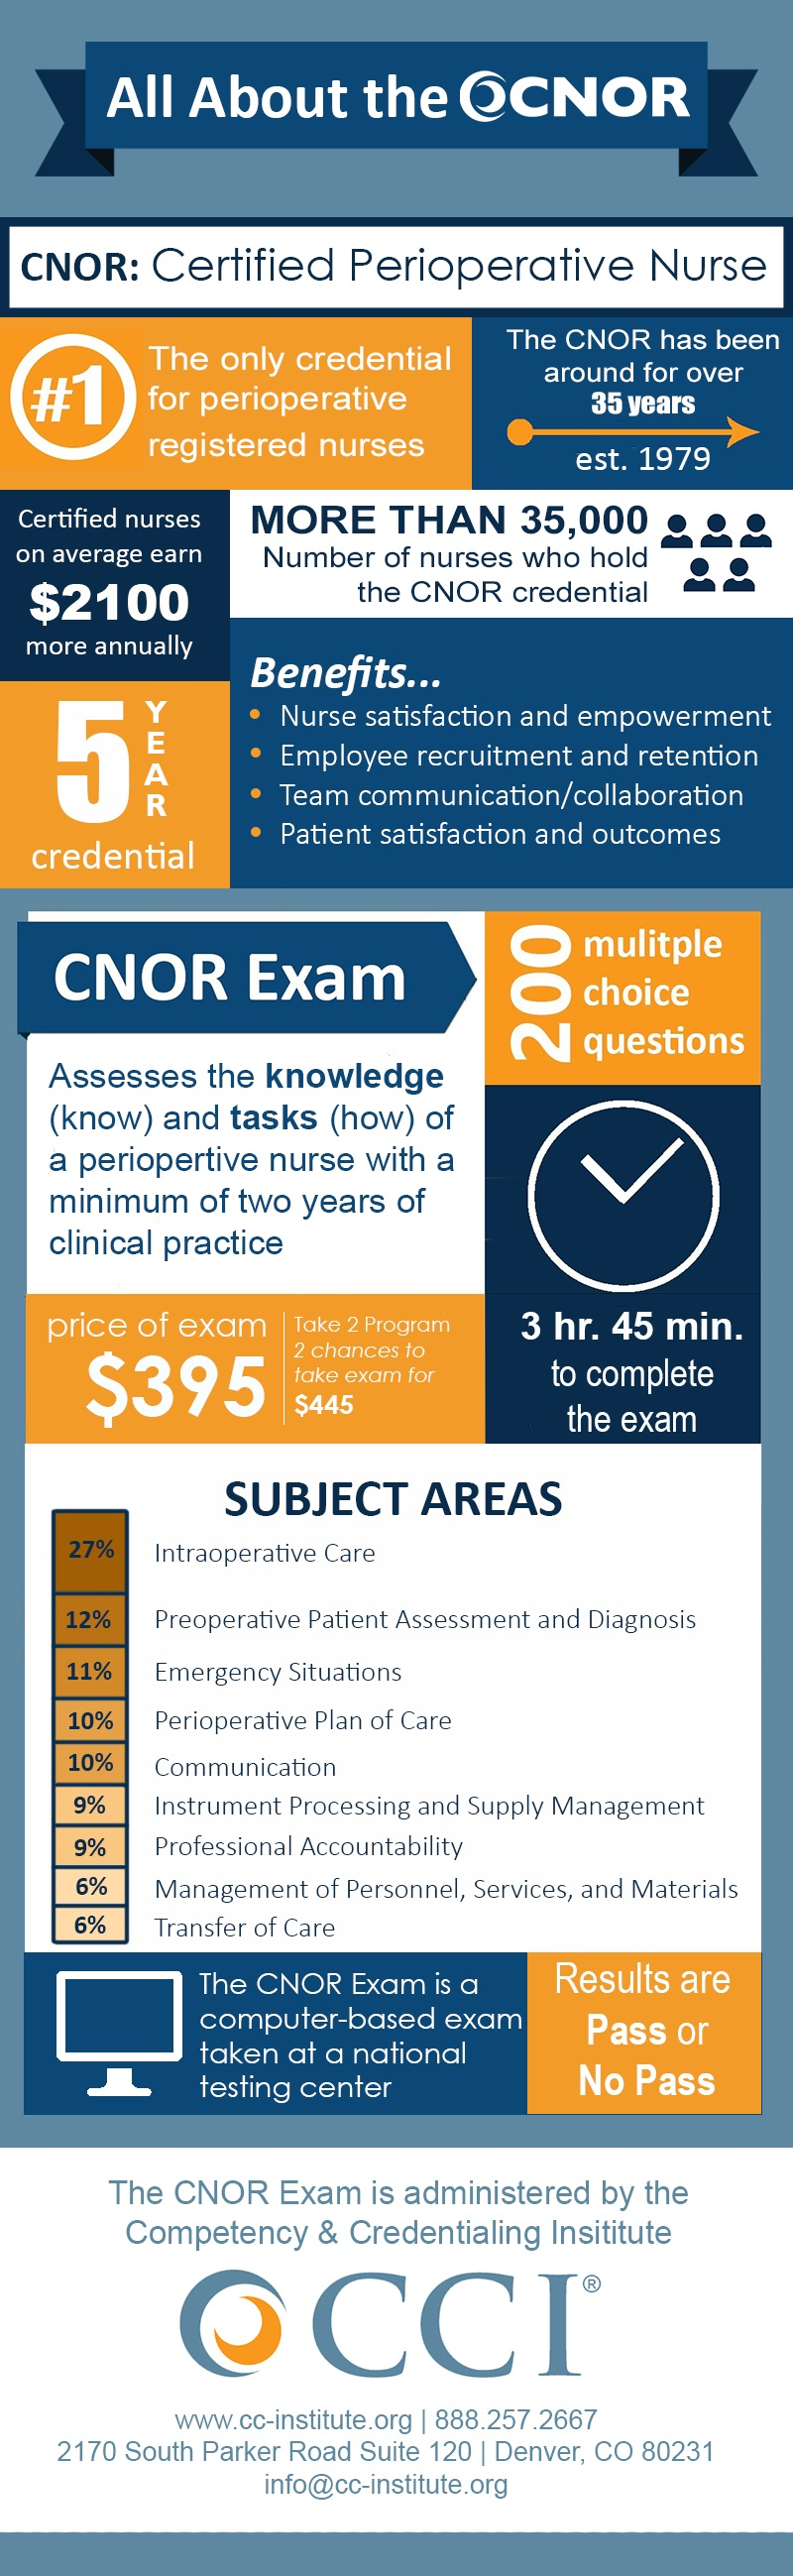 CNOR Certification Handbook Download - info.cc-institute.org